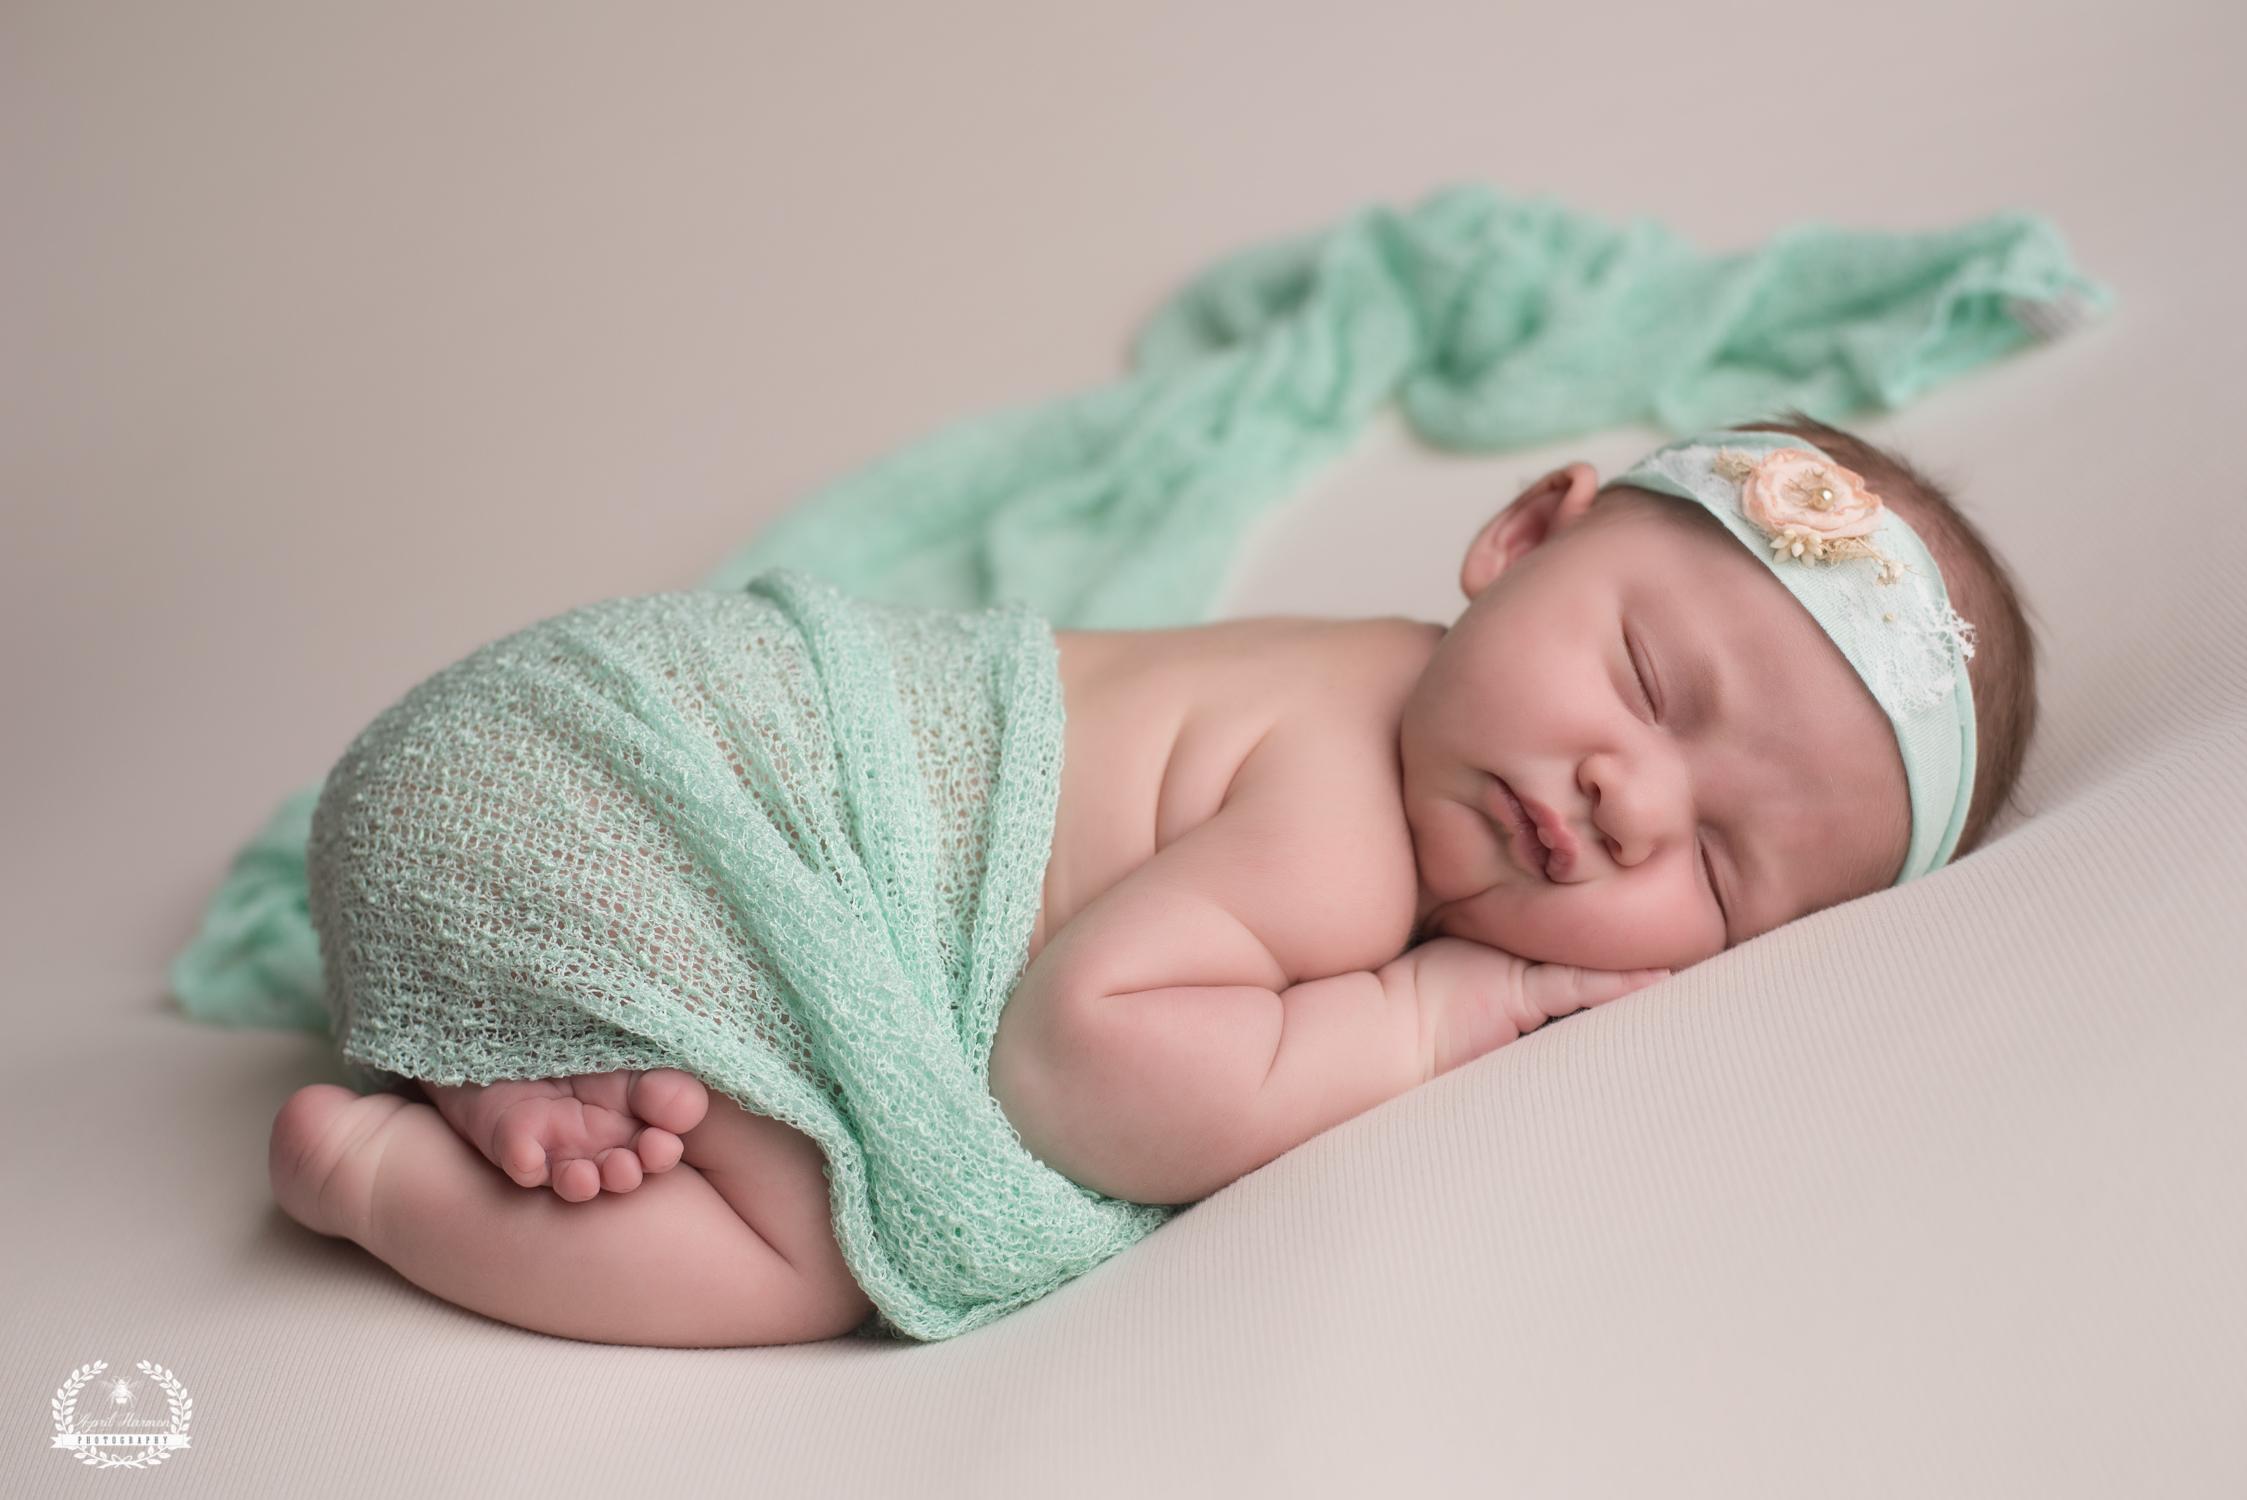 southwest-kansas-newborn-photography11.jpg